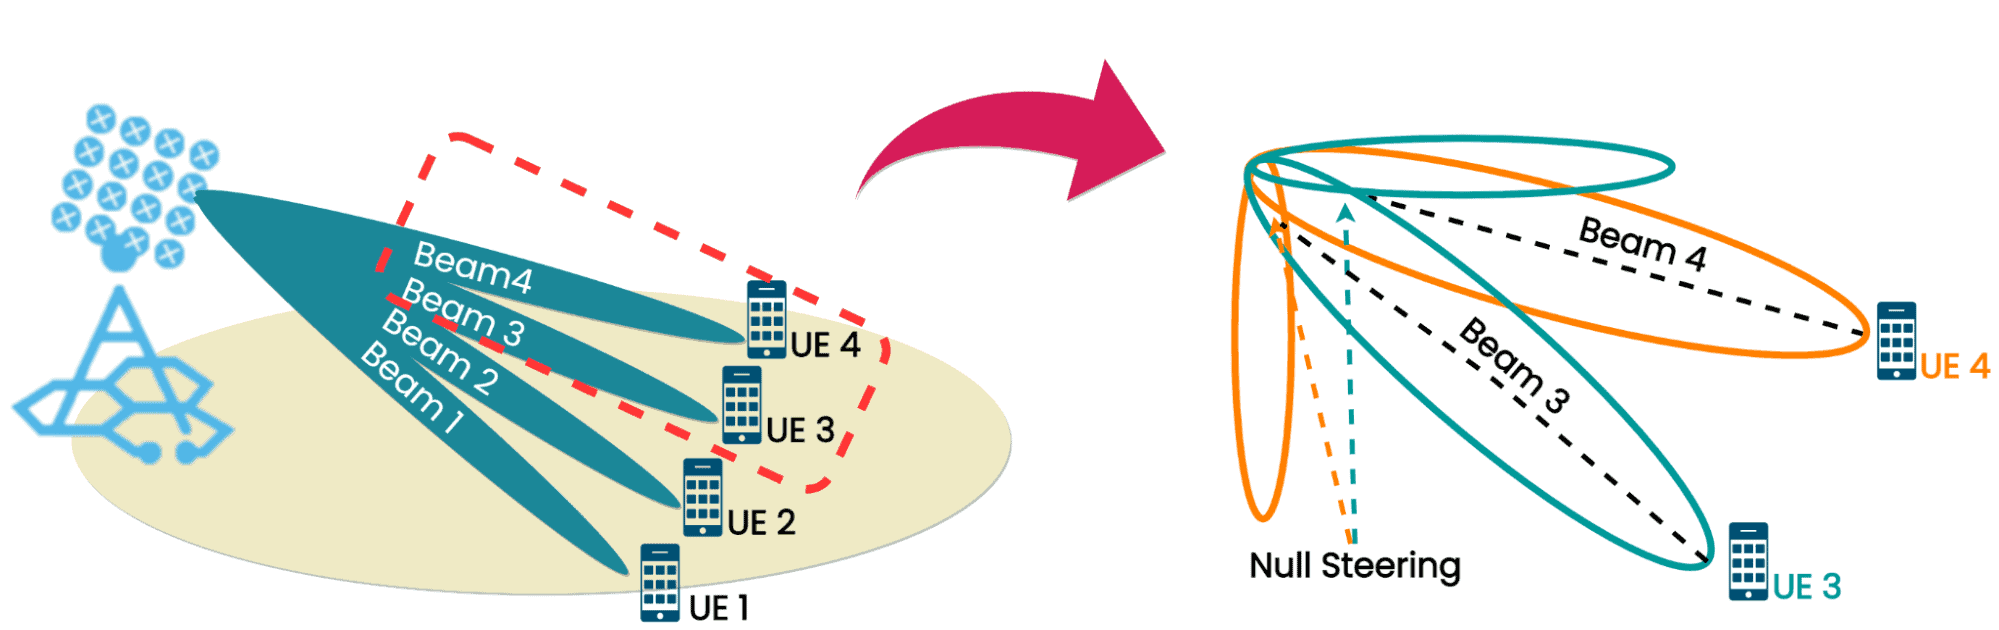 Smart Antennas and Beamforming